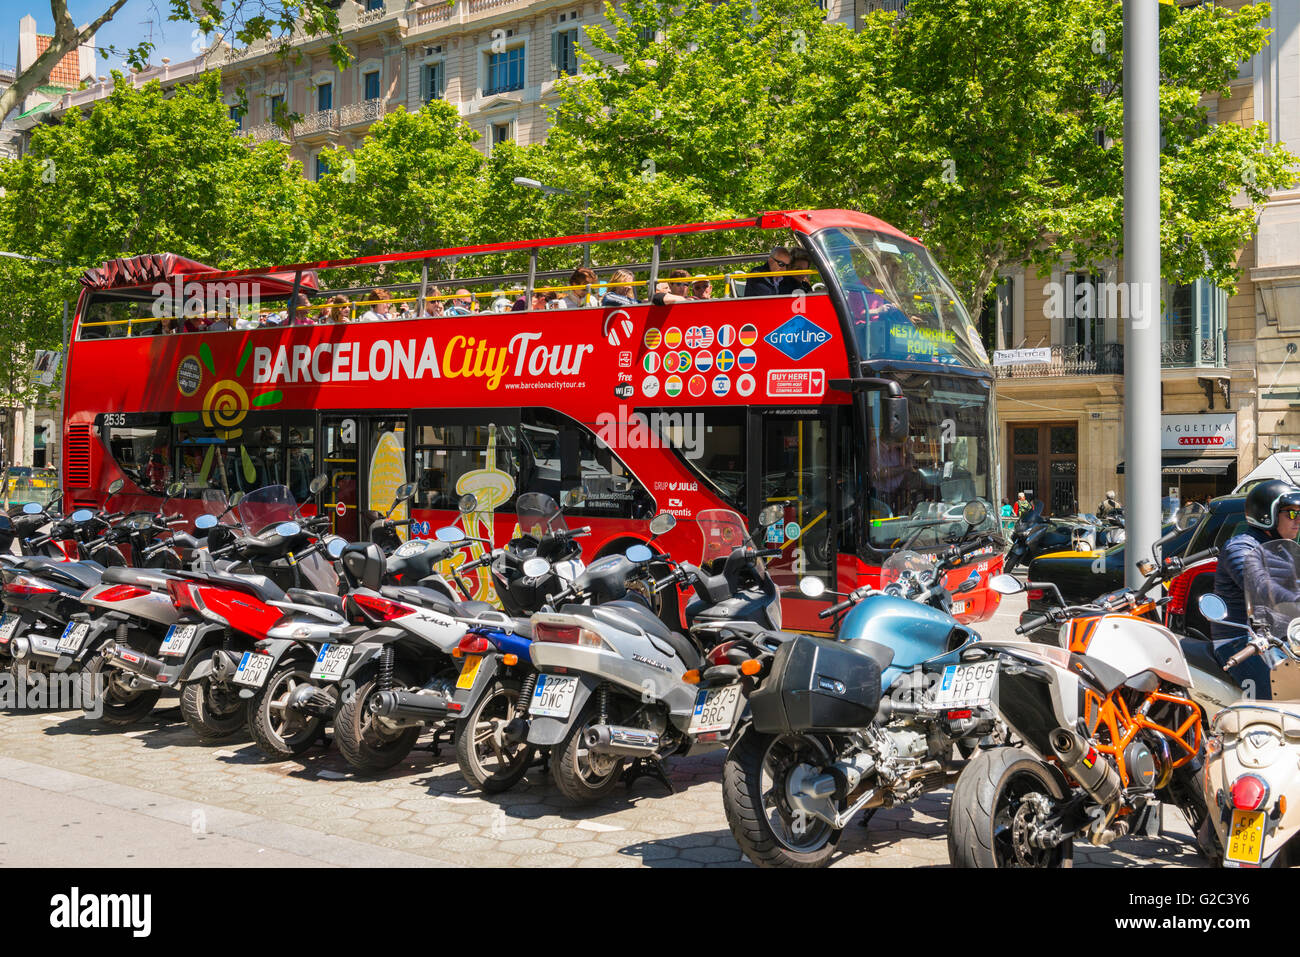 Spain Catalonia Barcelona Eixample Passeig de Gracia City Tourist Bus red double decker open top by motor bike cycle - Stock Image